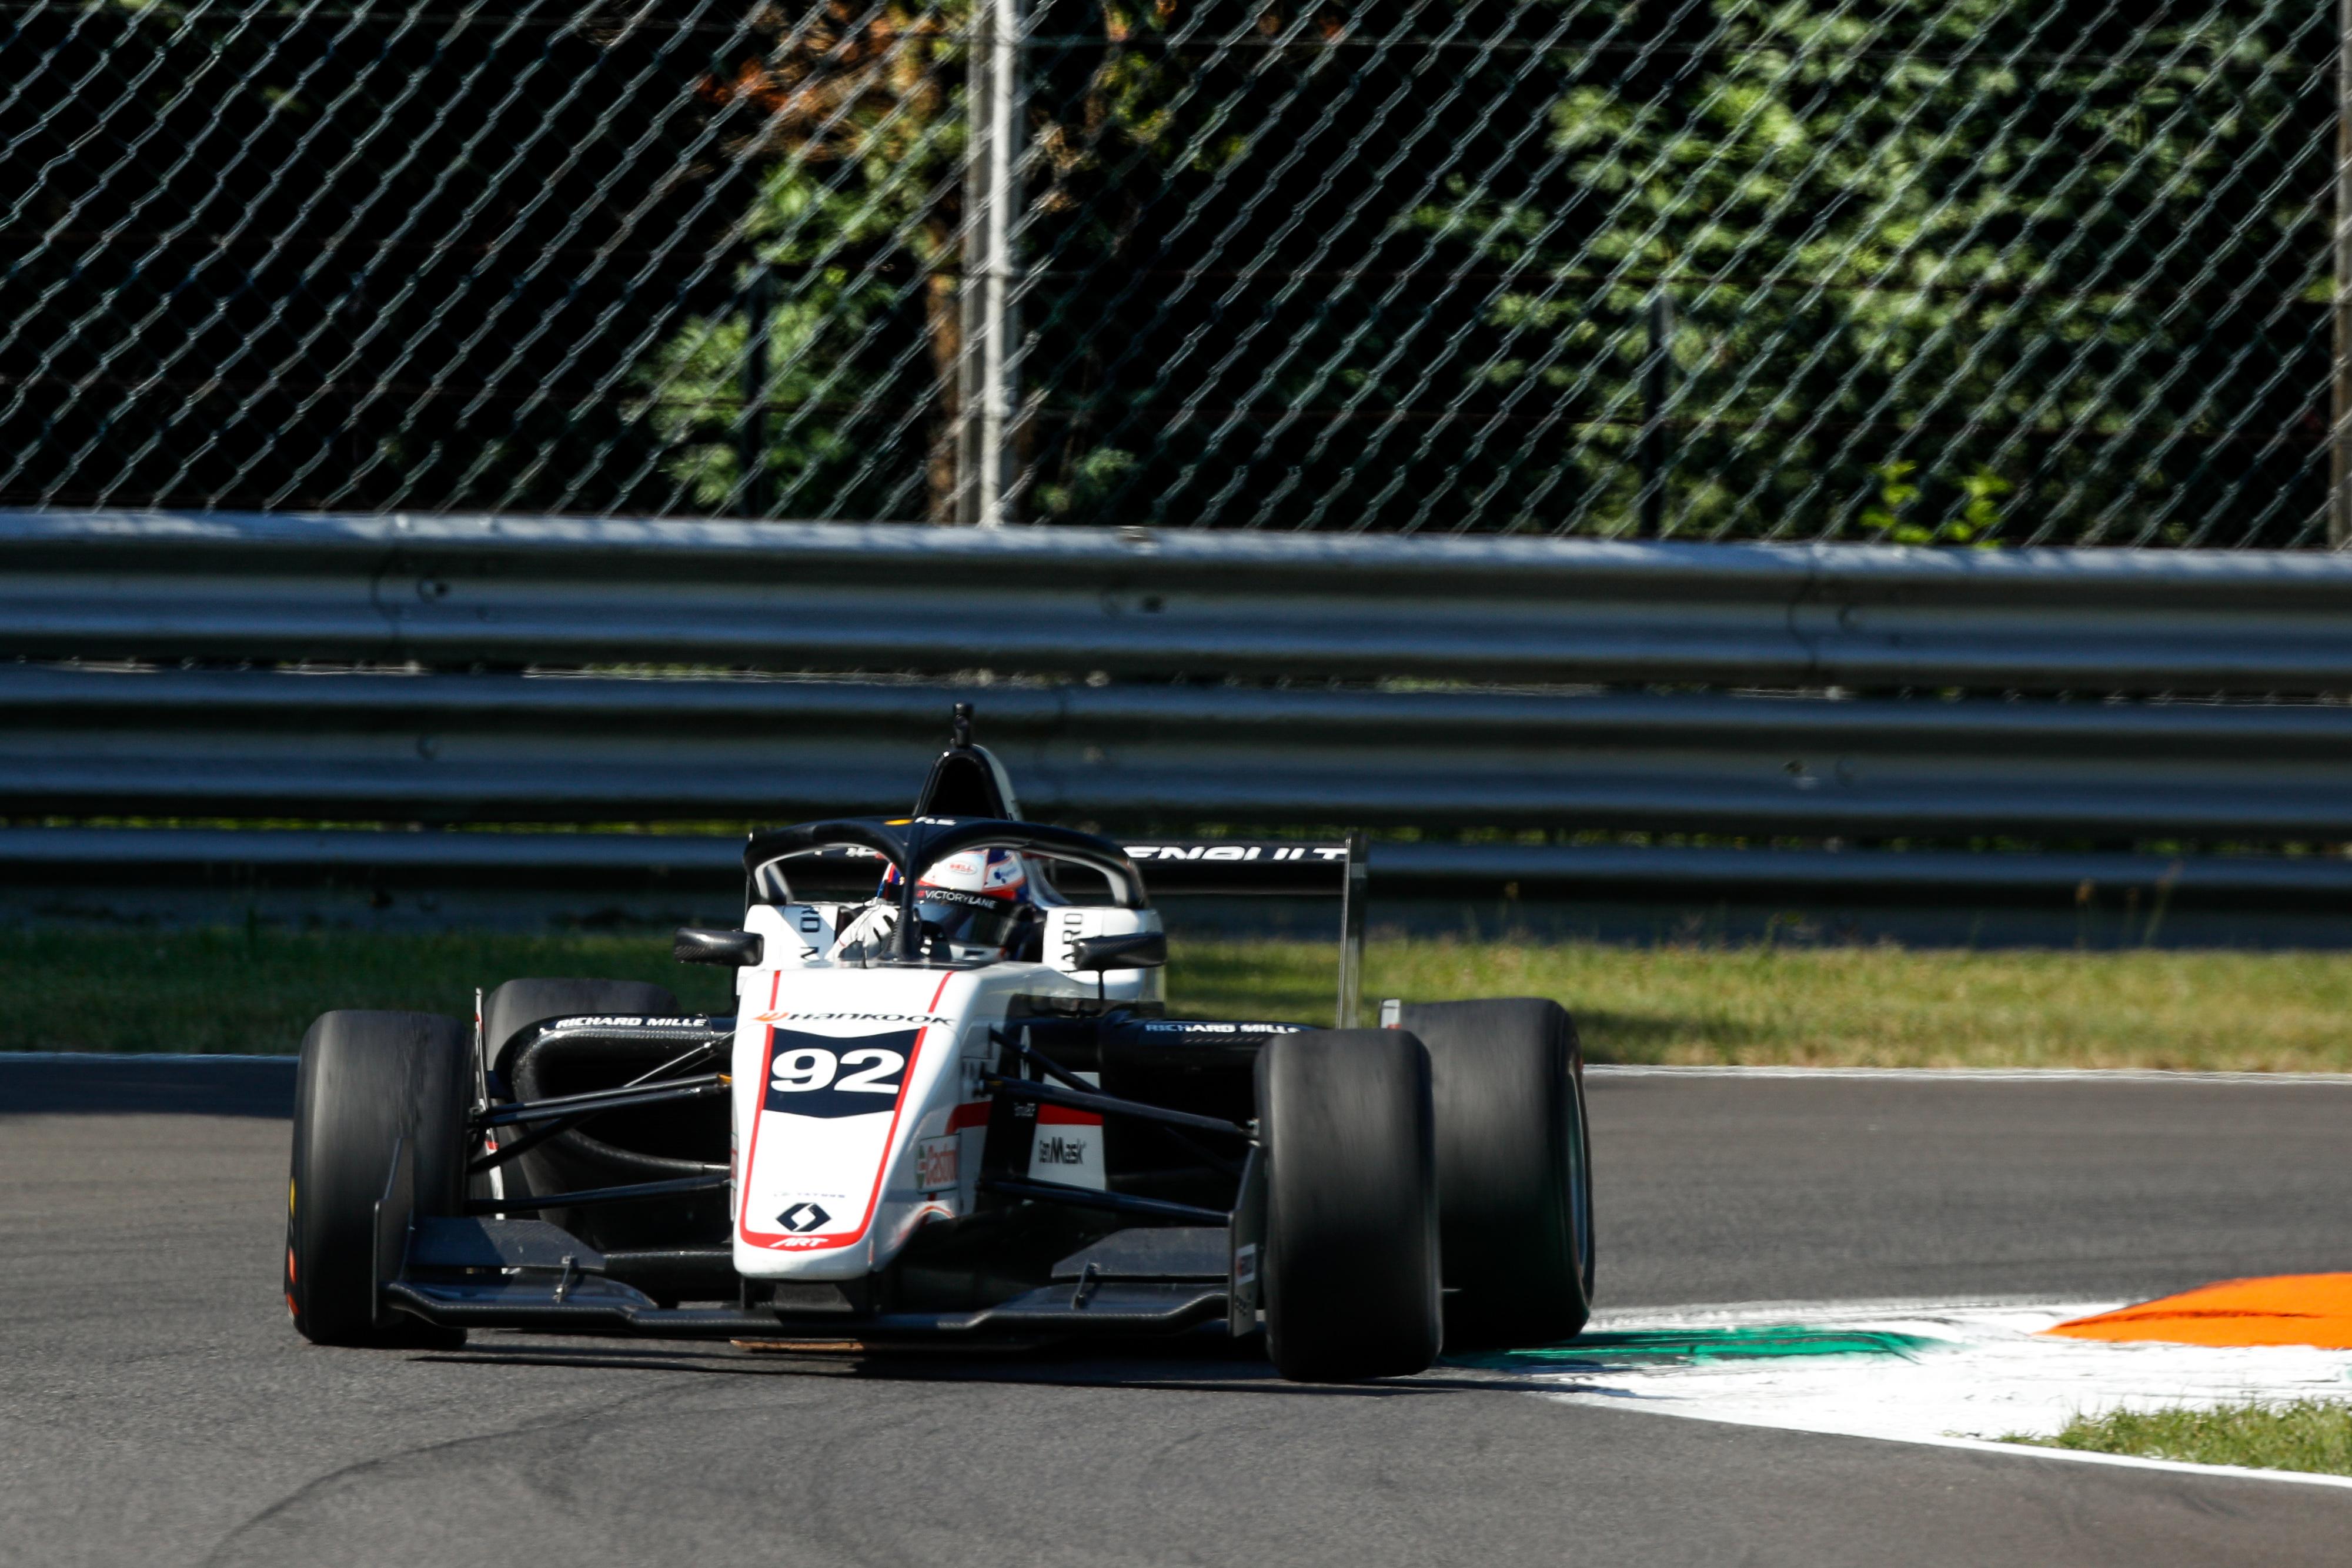 Formula Renault Eurocup 2020: Monza